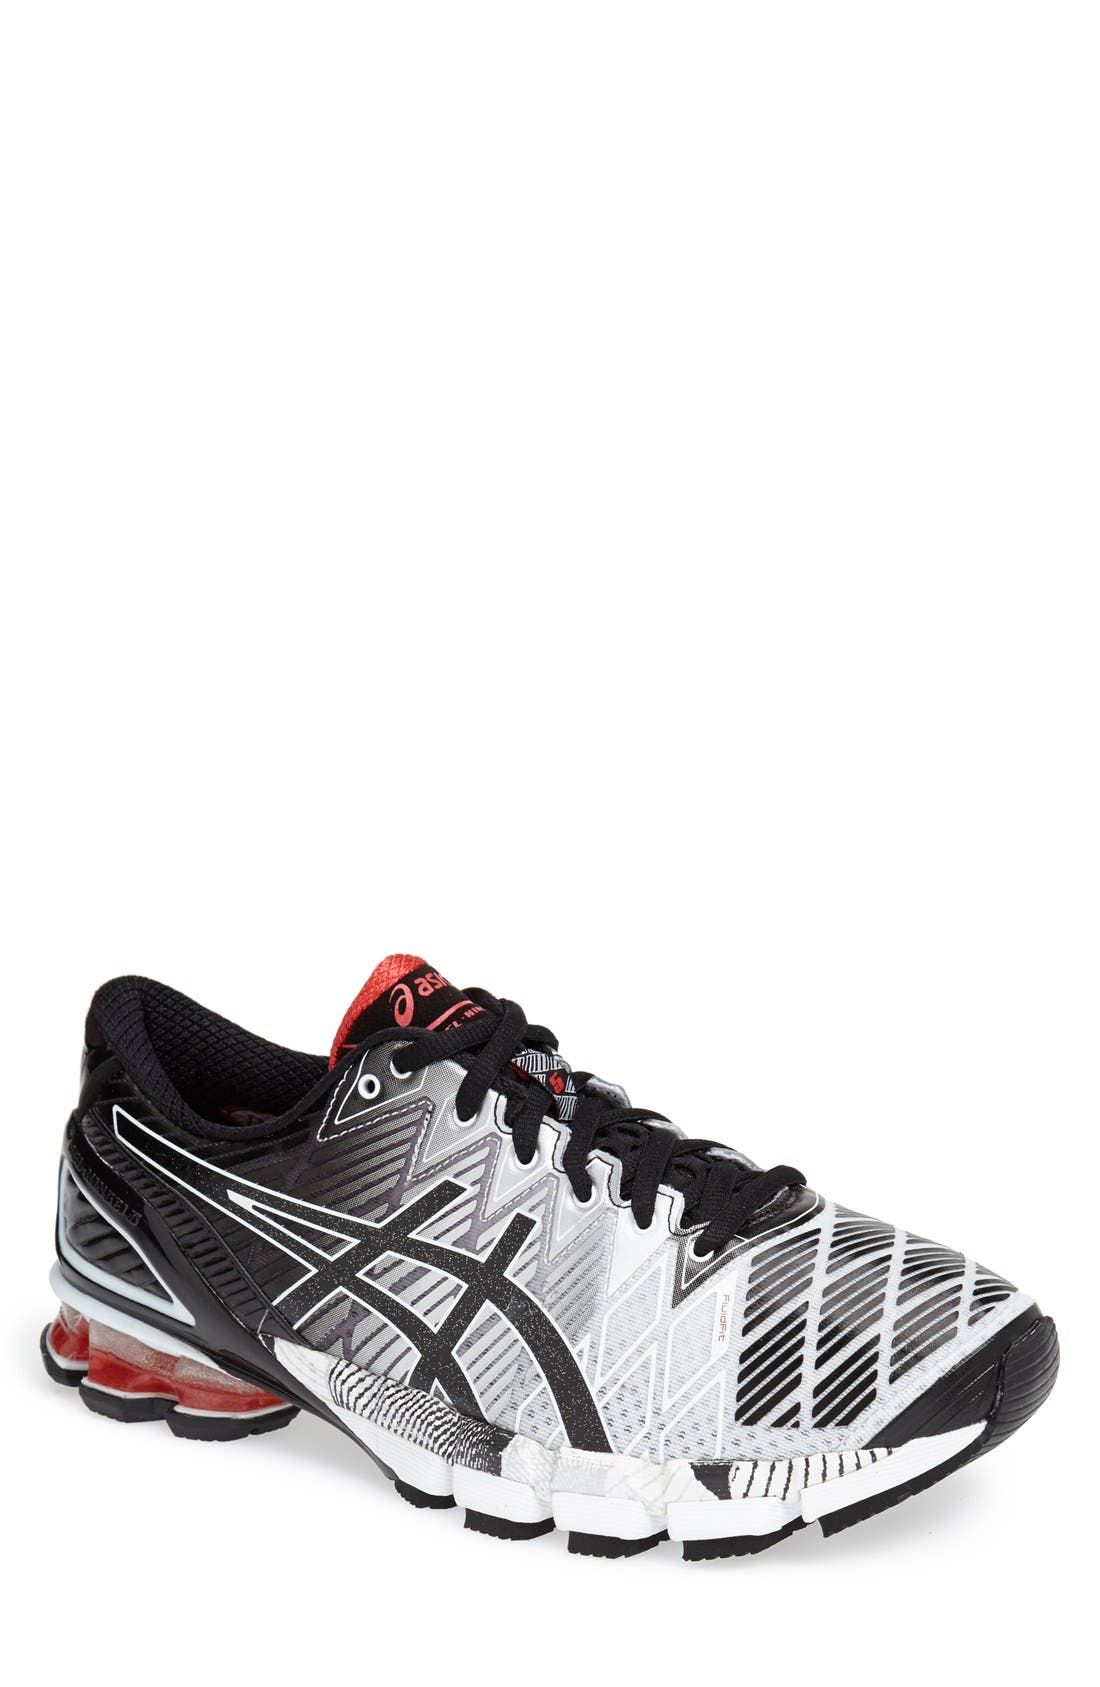 Alternate Image 1 Selected - ASICS® 'GEL-Kinsei 5' Running Shoe (Men)